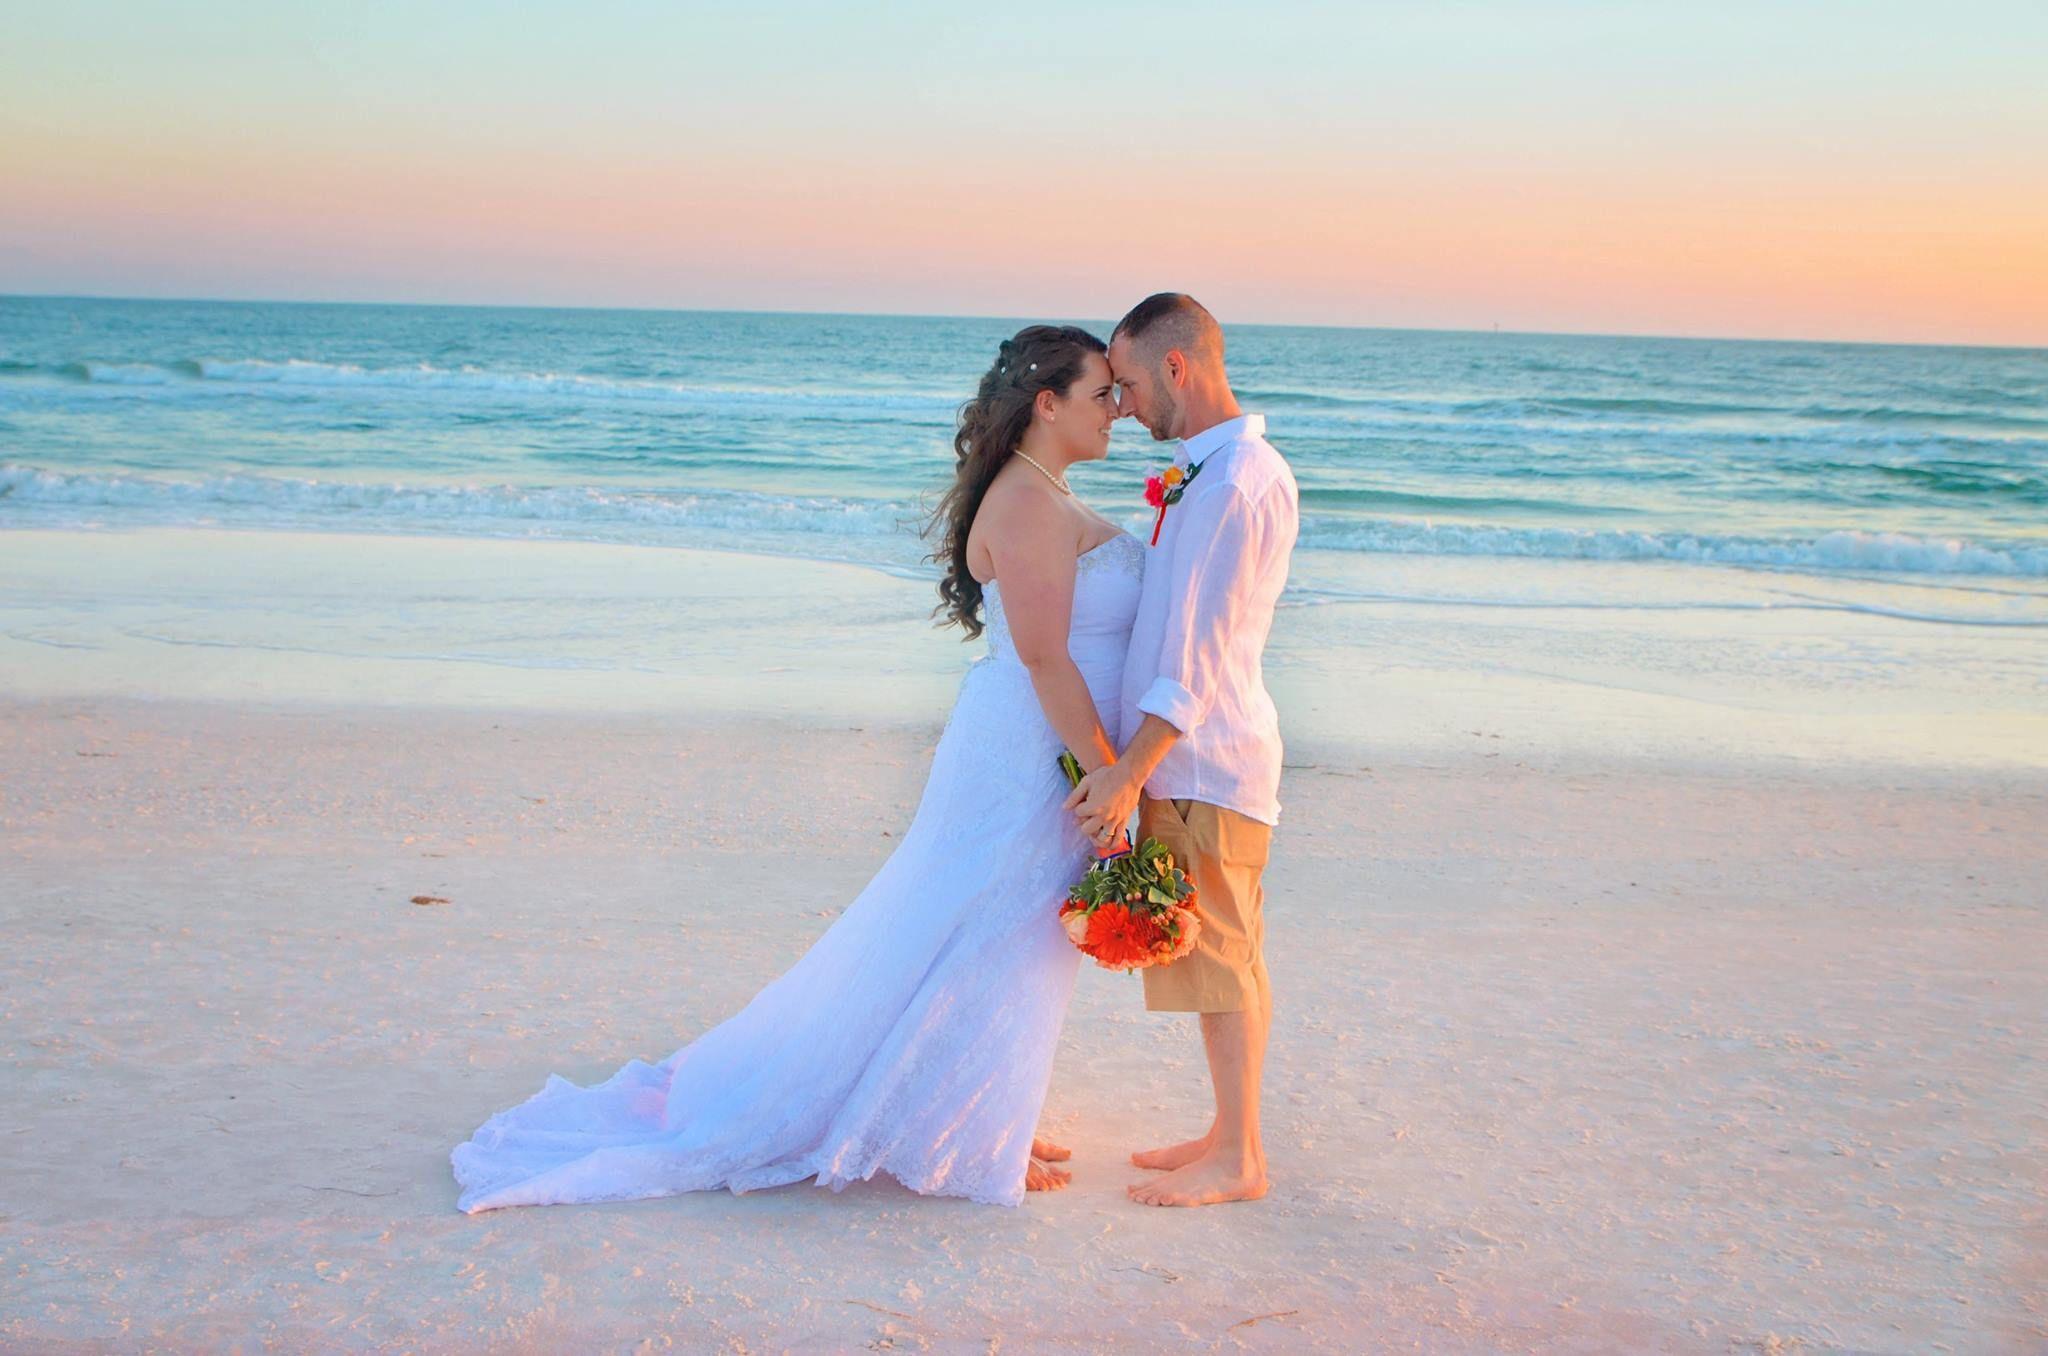 Panama City Beach Wedding Ceremony With Bamboo Arbor Panama City Beach Wedding Wedding Beach Ceremony Diy Beach Wedding